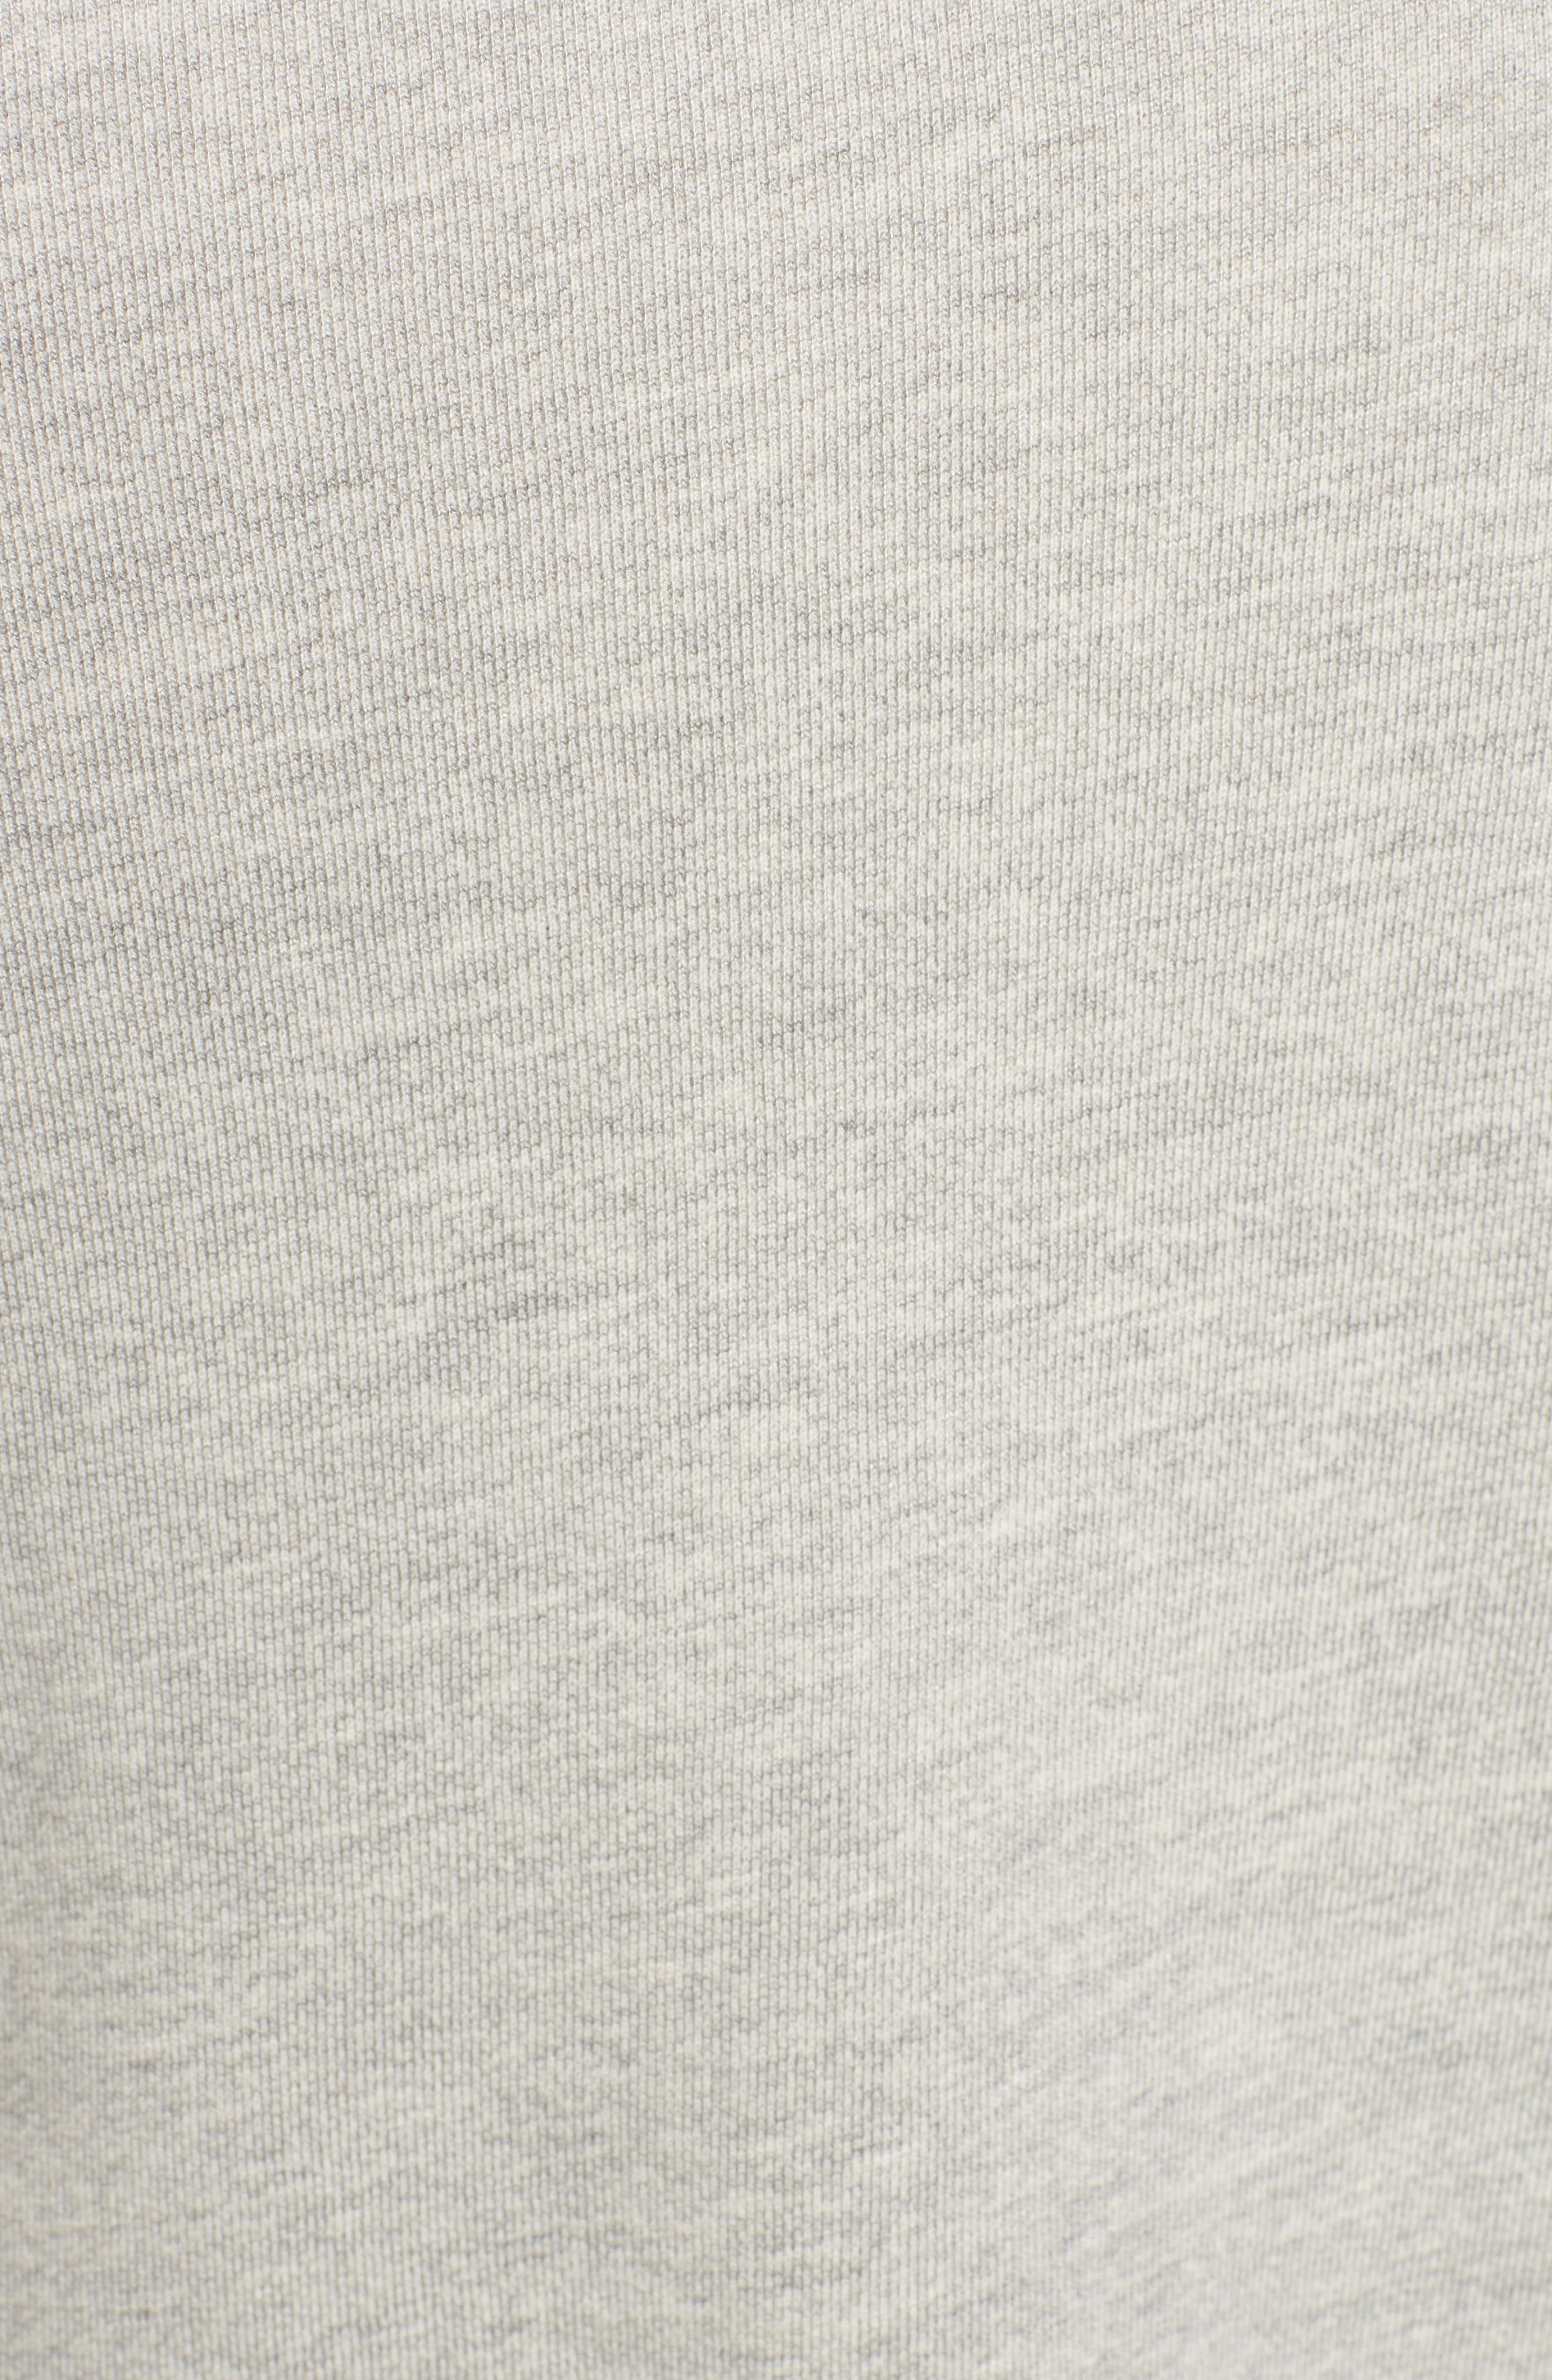 Heart Side Zip Sweatshirt,                             Alternate thumbnail 5, color,                             039